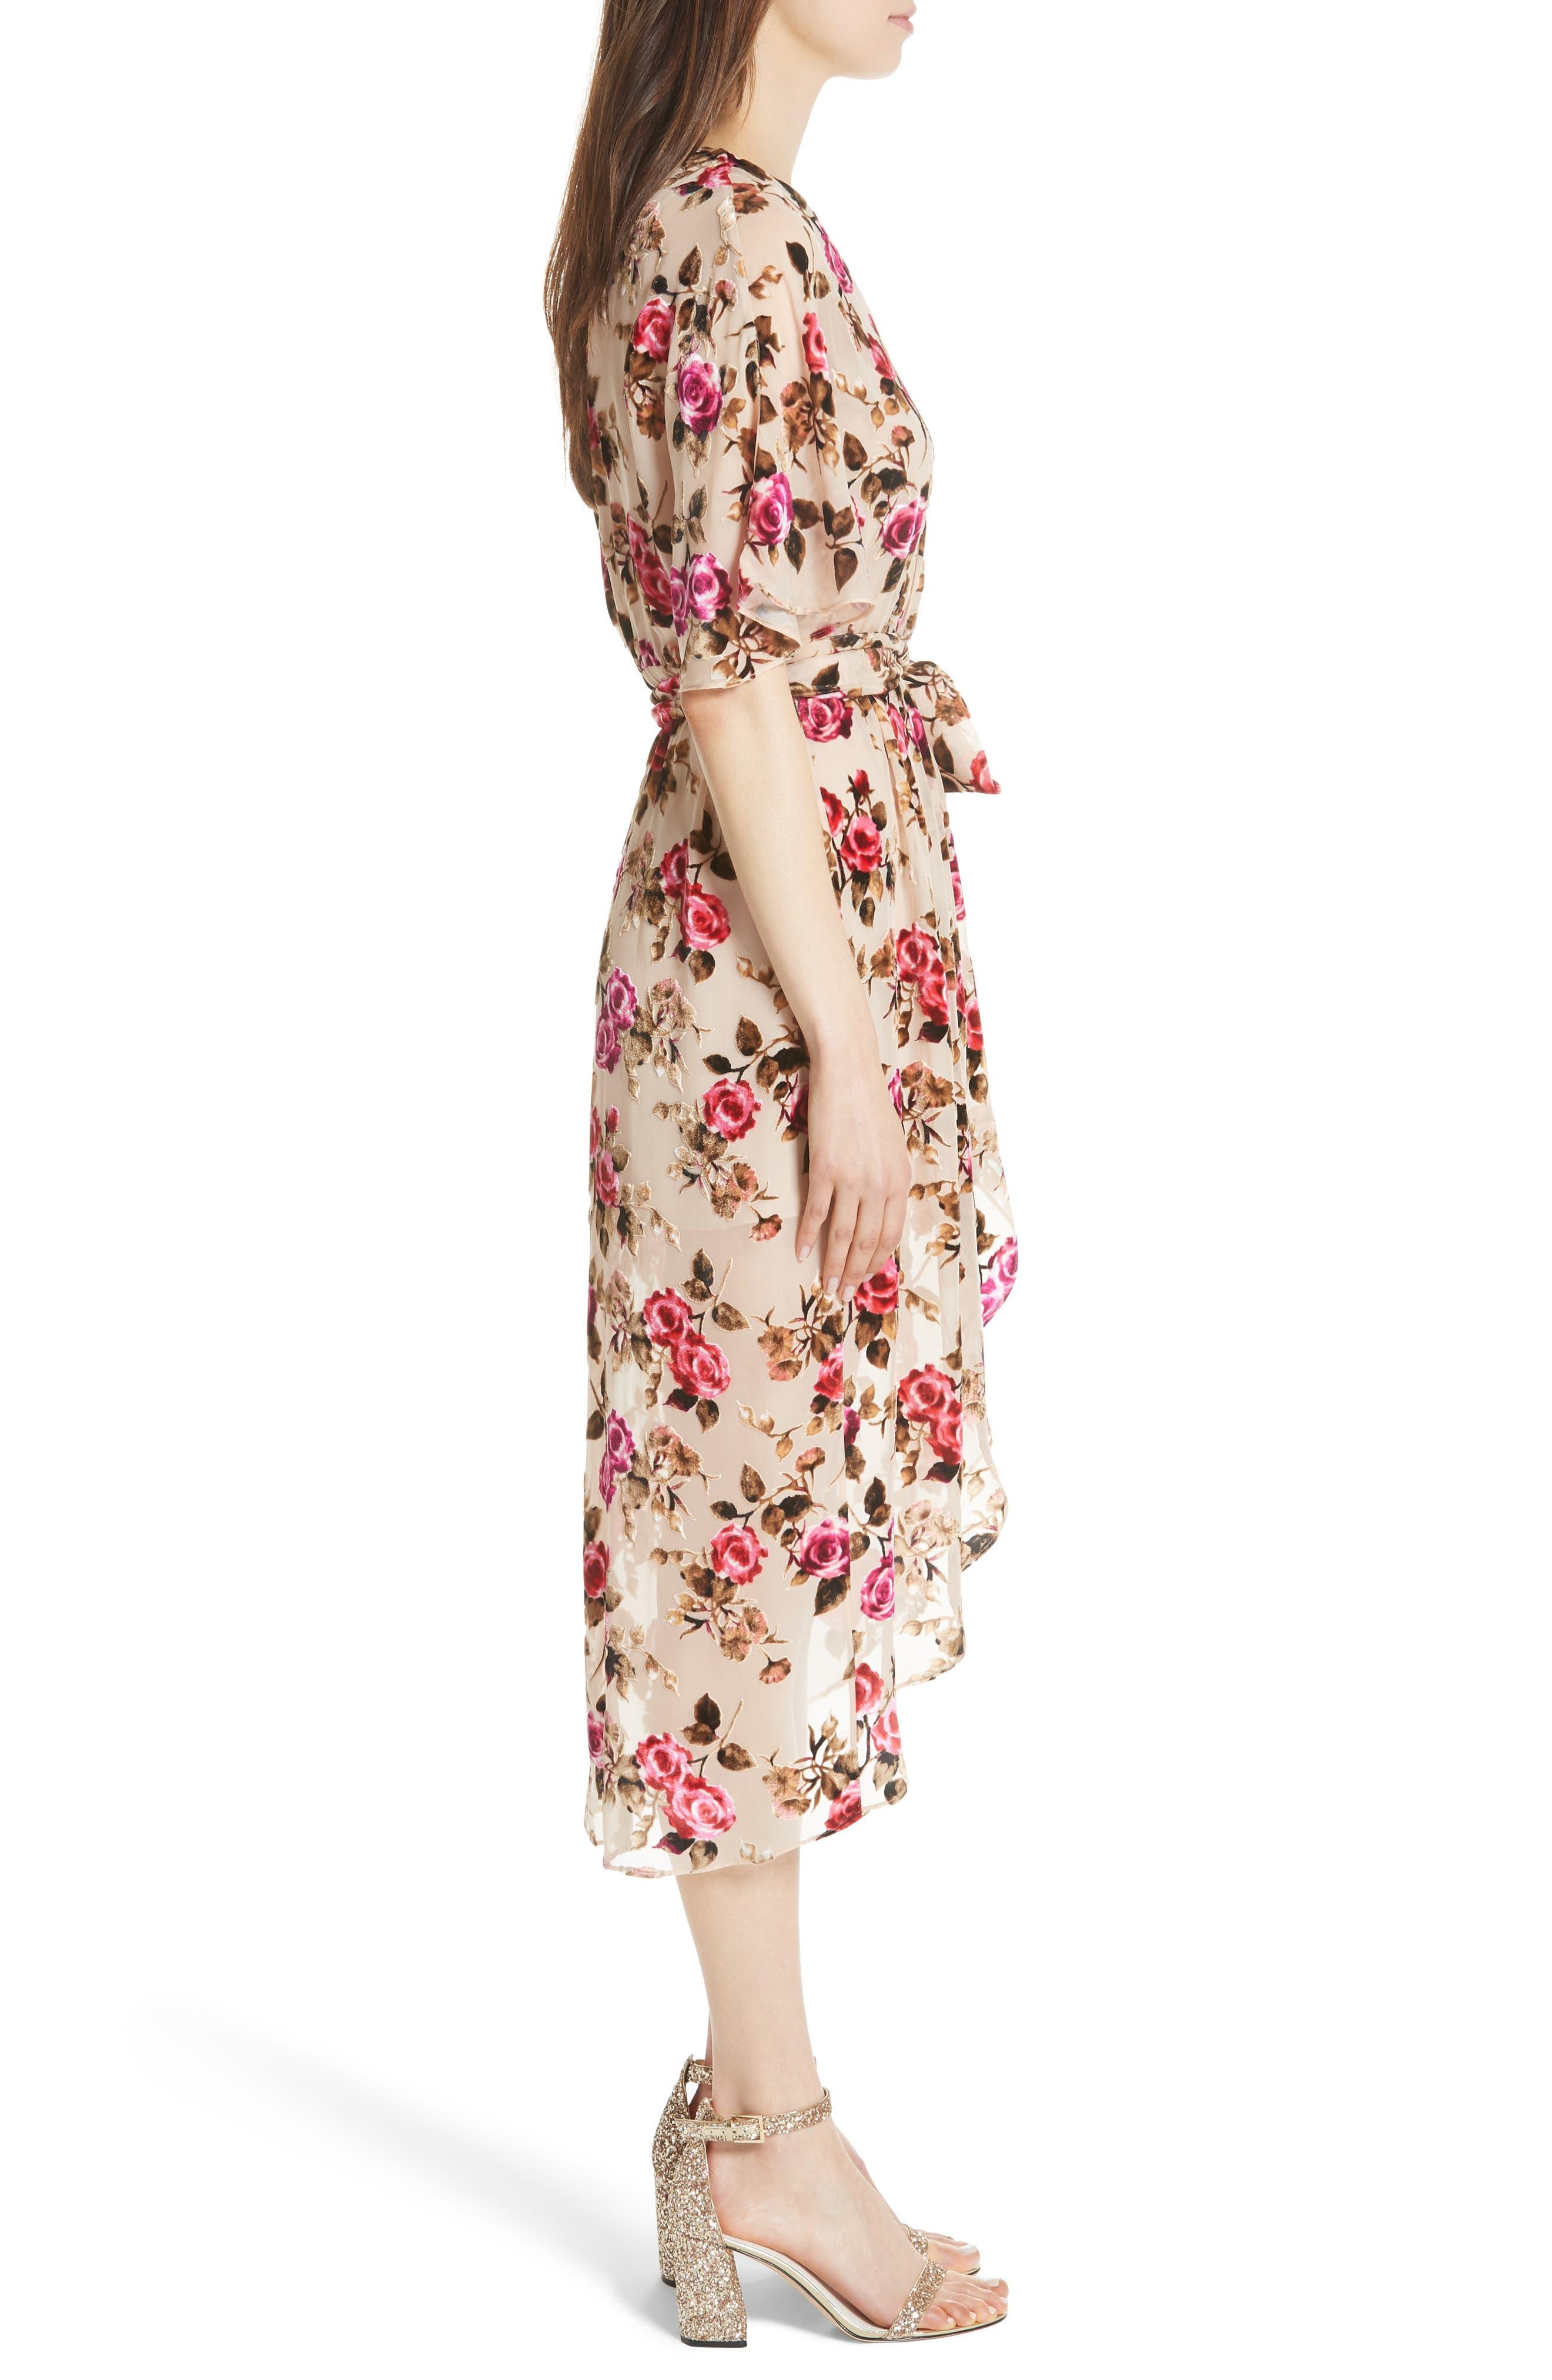 ALICE + OLIVIA,                             Clarine Floral Faux Wrap Dress,                             Alternate thumbnail 4, color,                             251